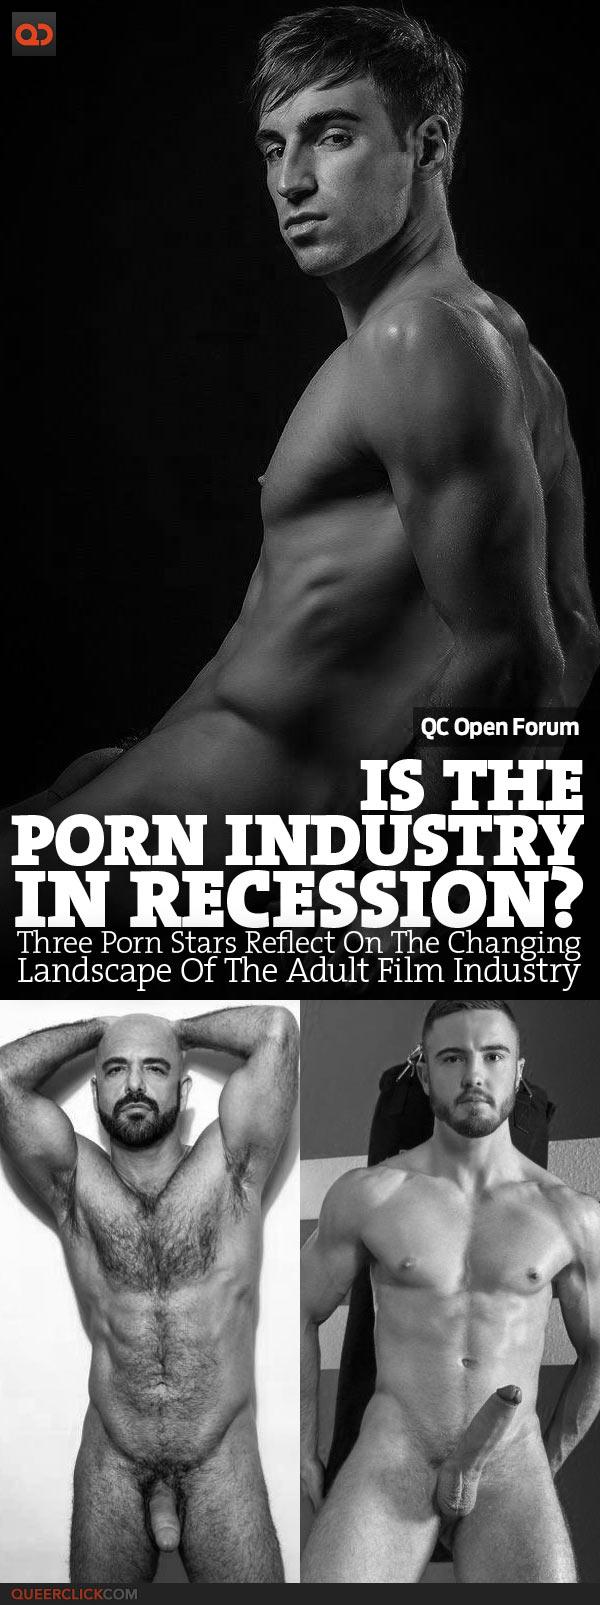 artsandculture article porn industry recession